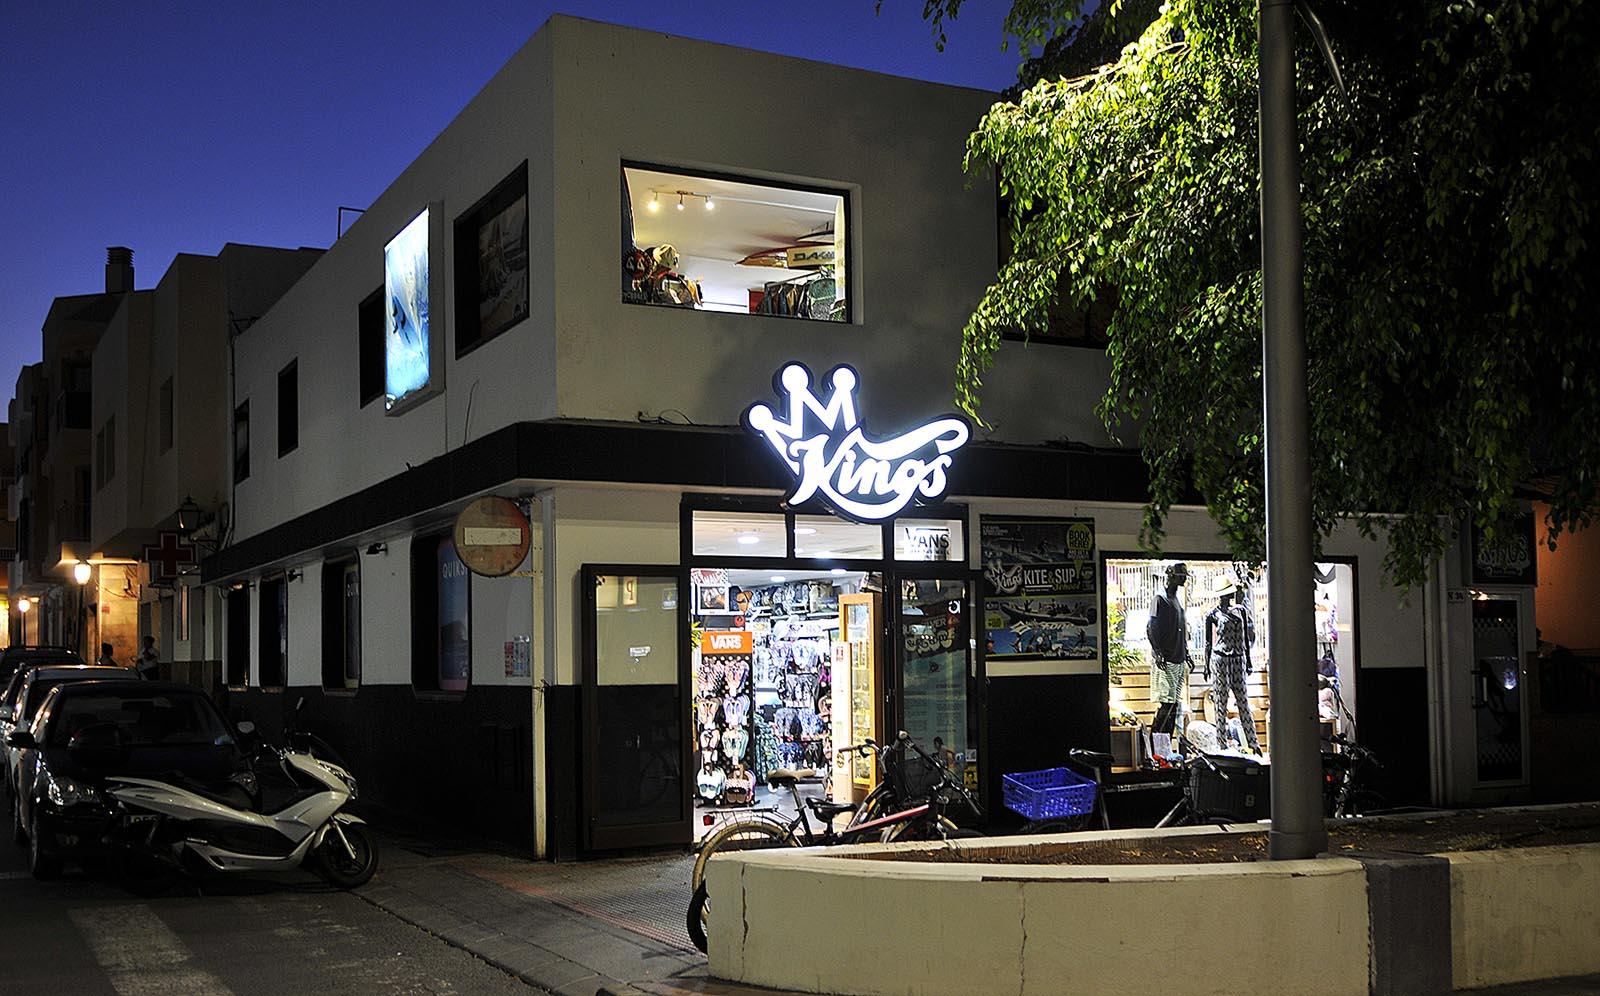 Entrada King Surf shop